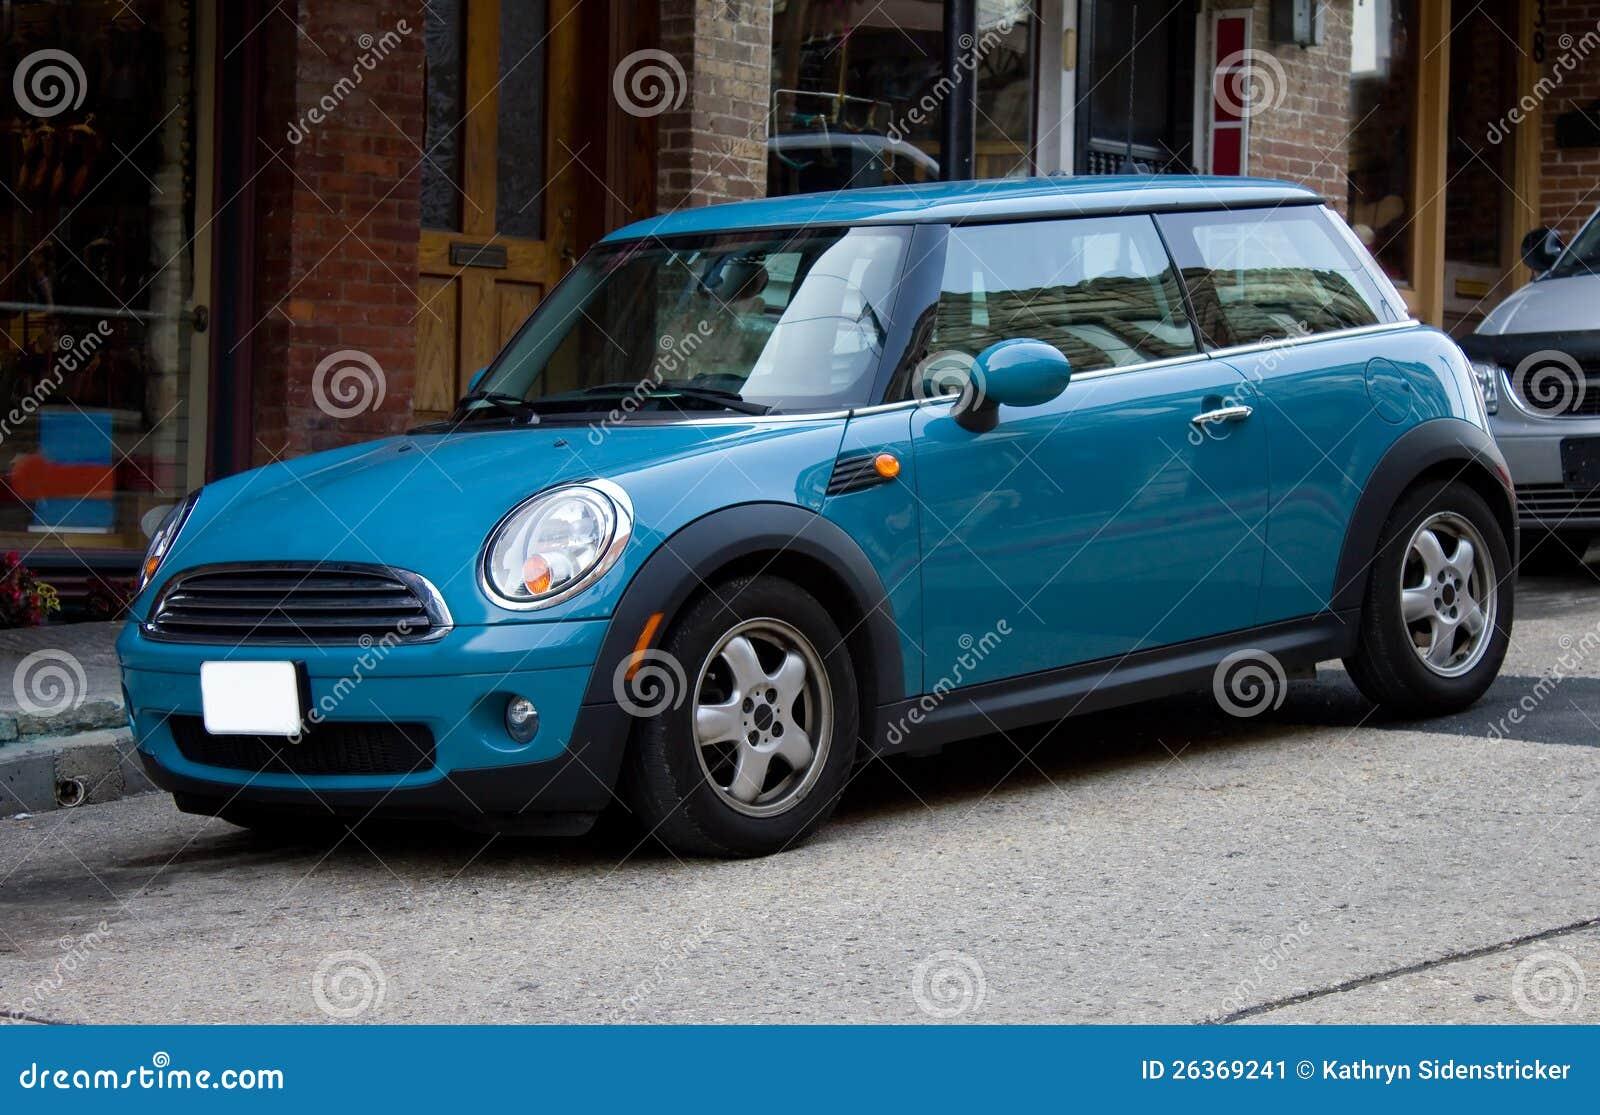 2012 Blue Mini Cooper Stock Image Image Of Light Icon